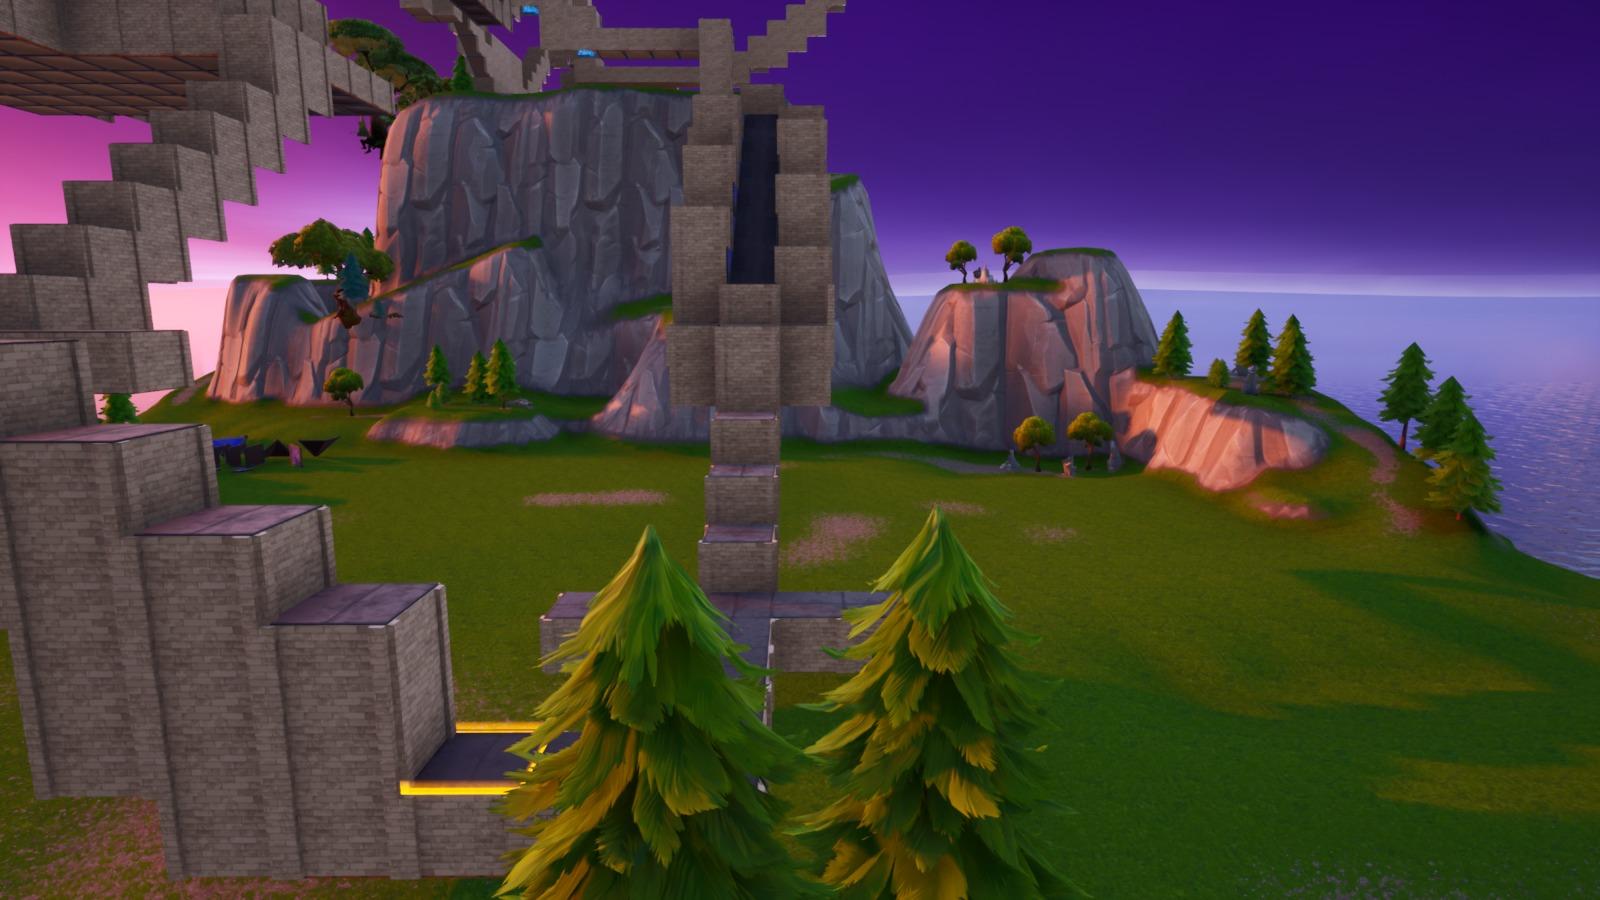 Fortnite Creative Roller Coaster Maps Roller Death Coaster D R 3 A M Fortnite Creative Map Code